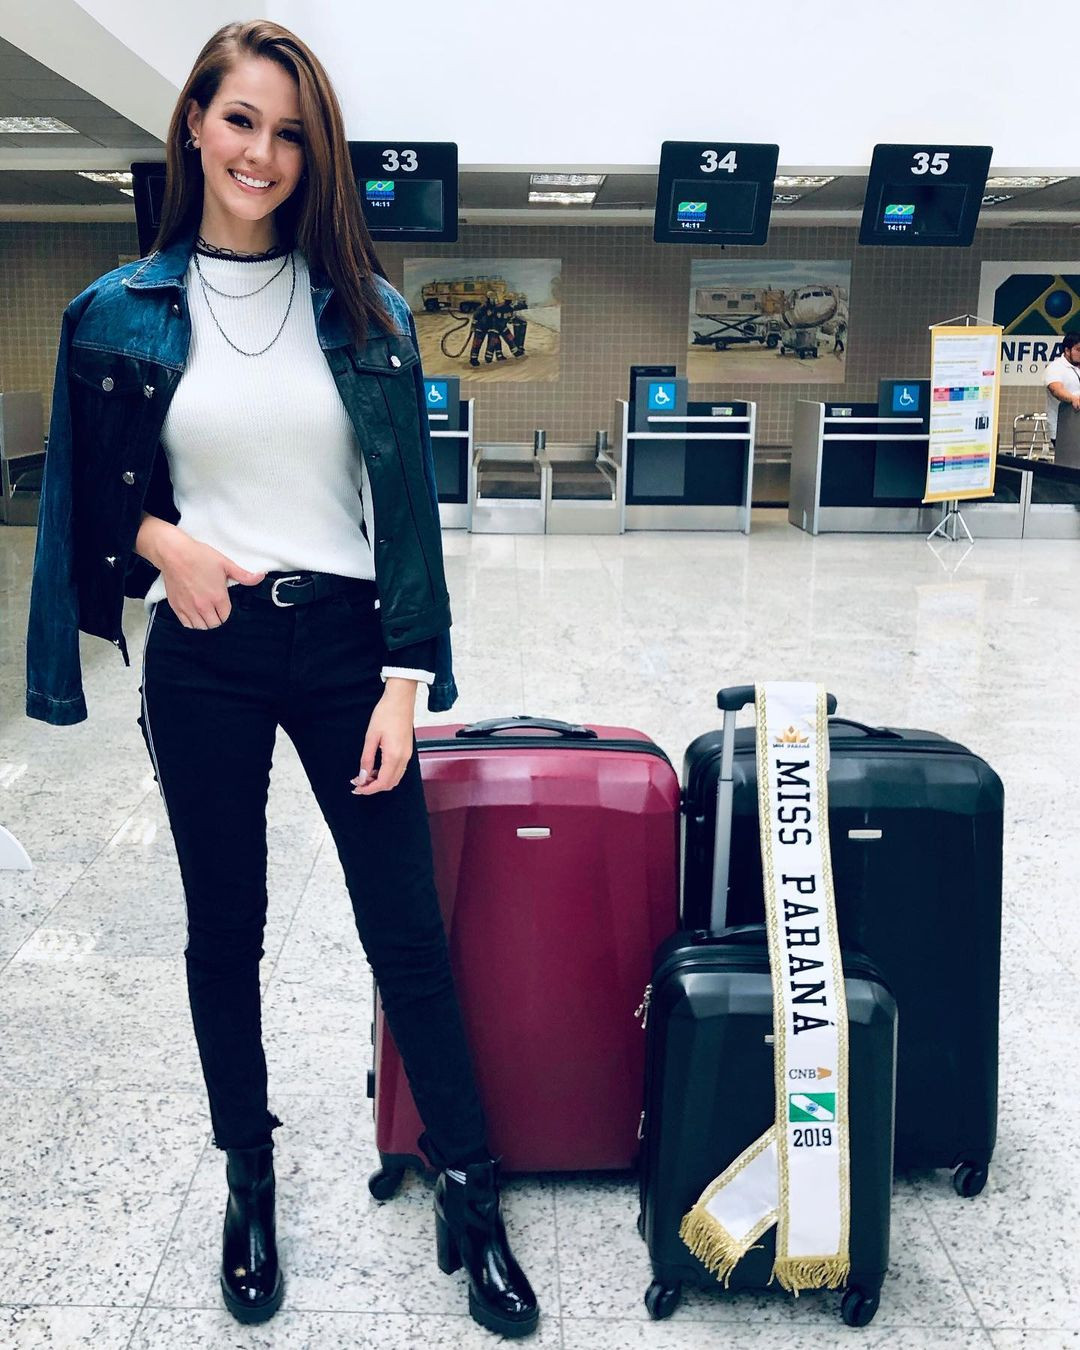 deise caroline ribas, top 10 de miss brasil mundo 2019/miss parana universo 2018/top 2 de miss teen international 2017. - Página 5 B8e1hl10